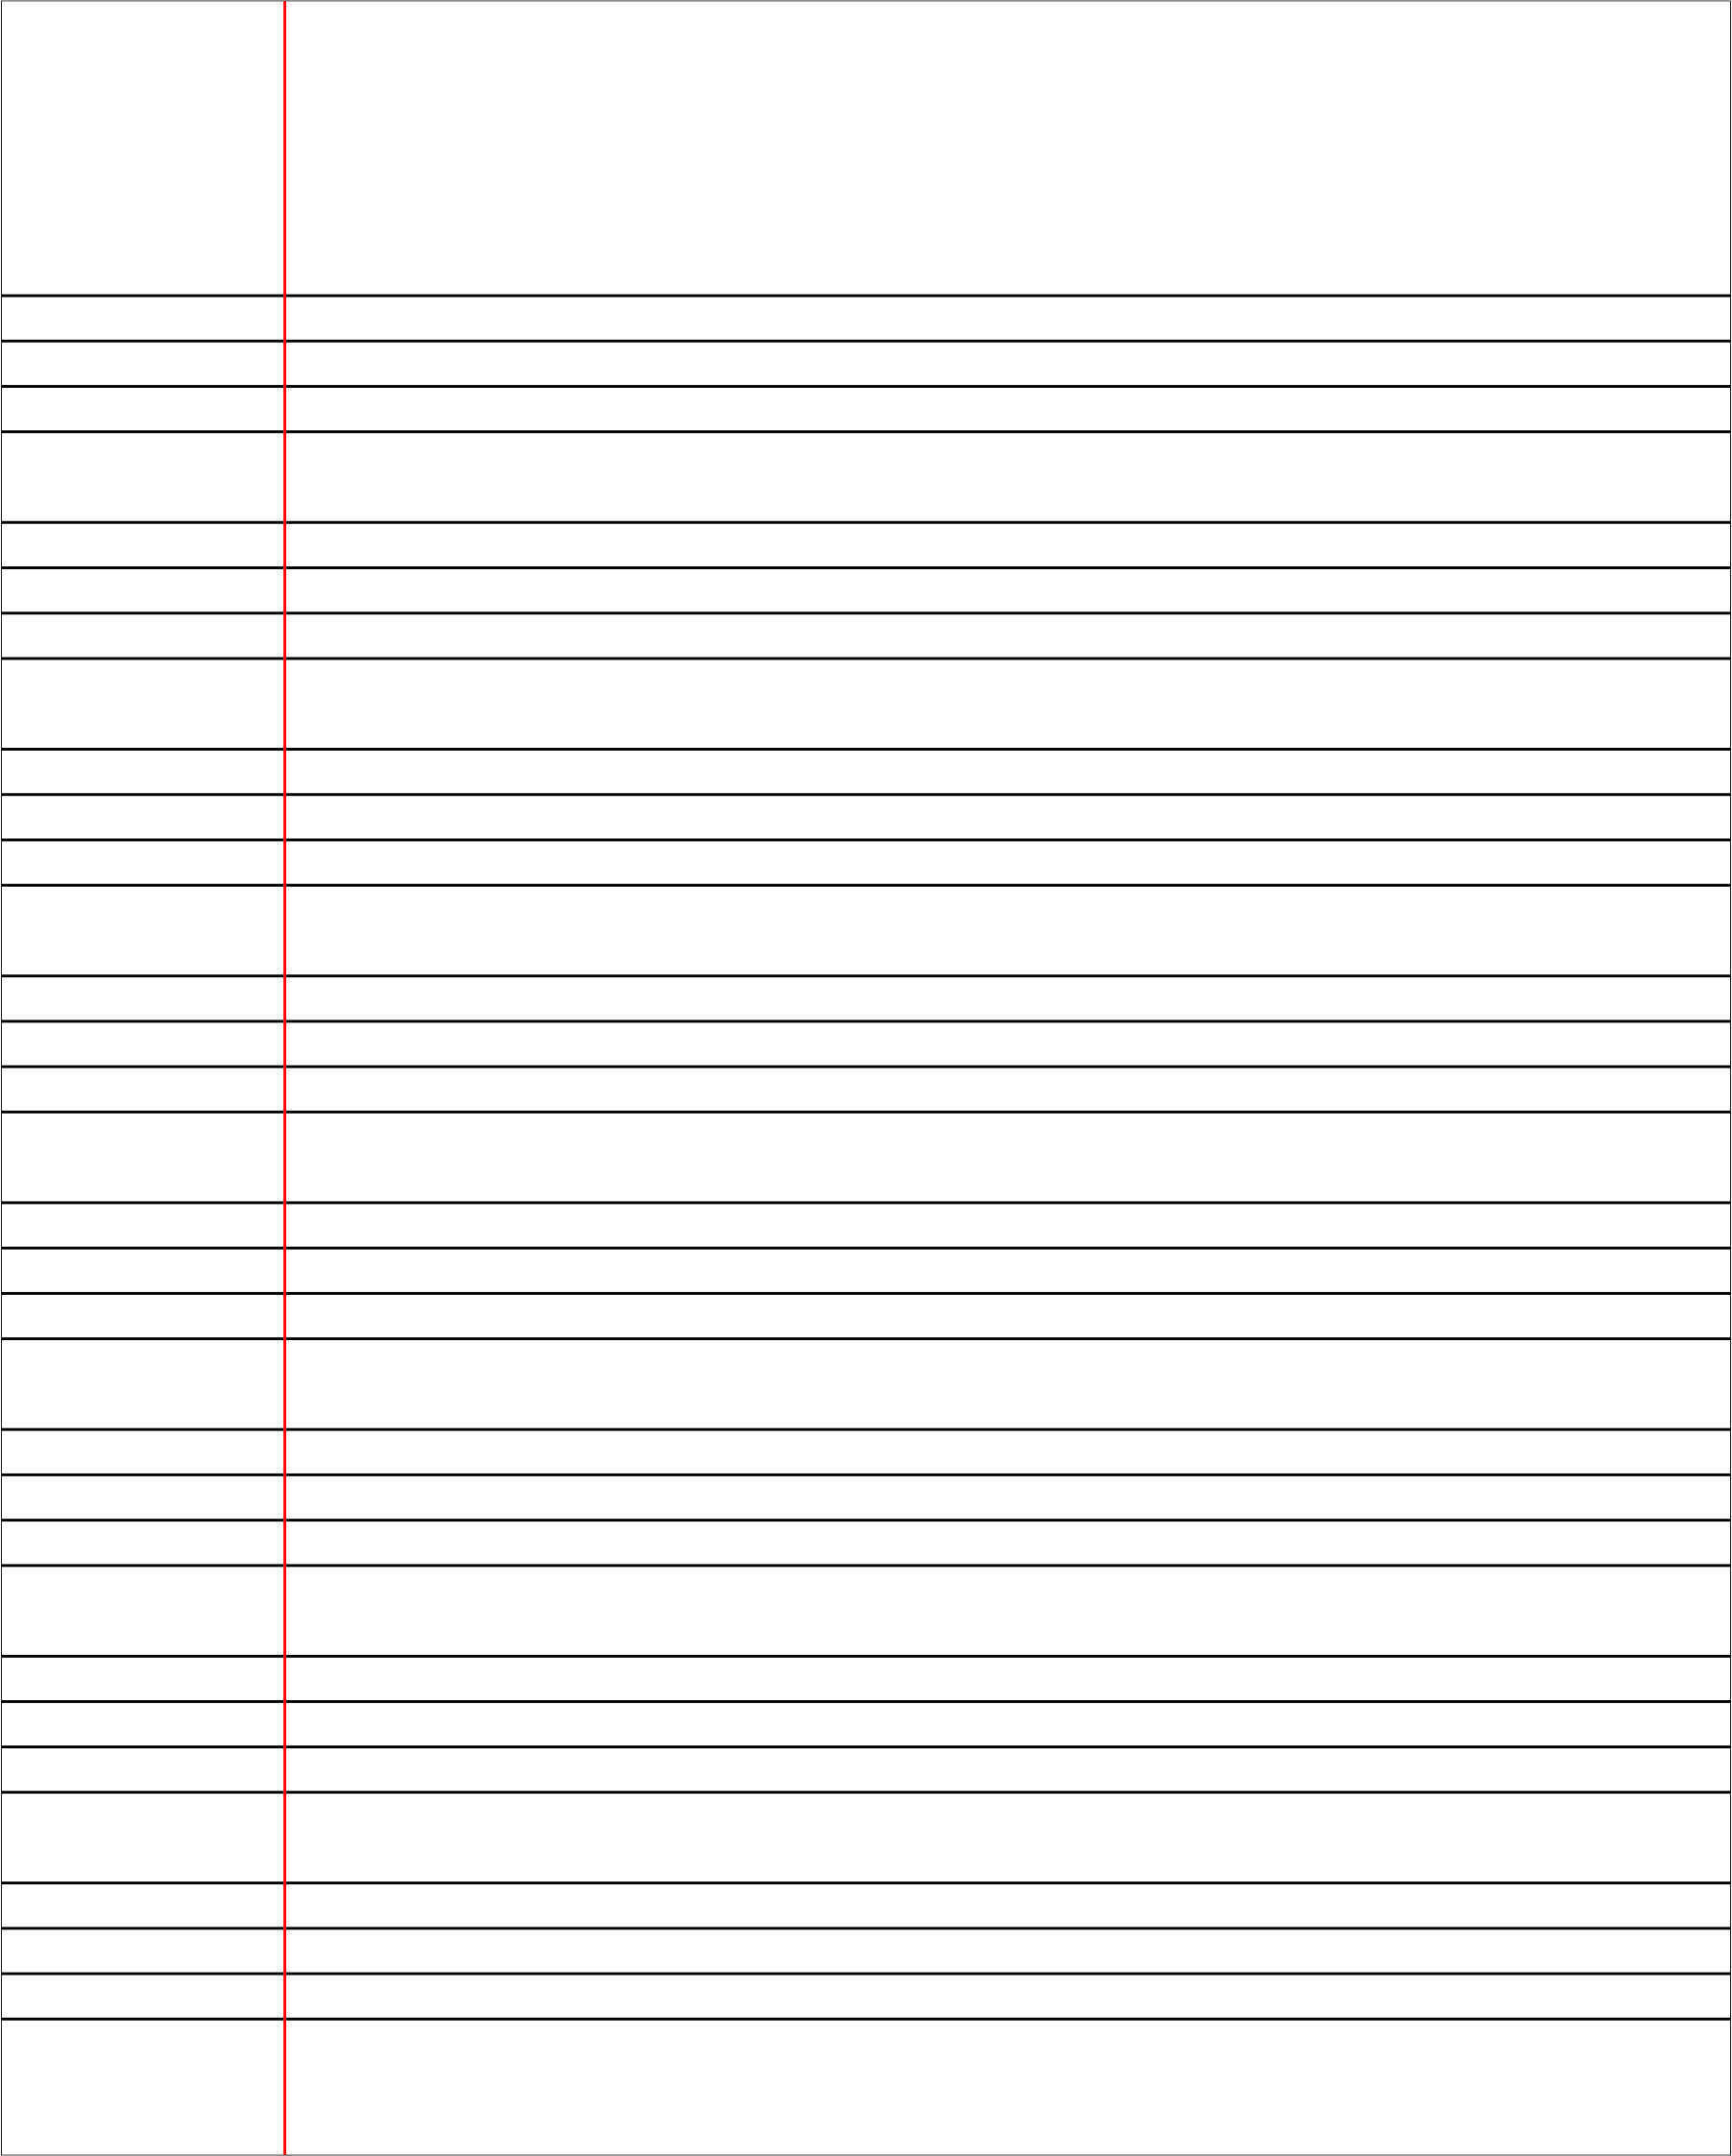 Sundaram Winner Brown Note Book (Four Line) - 76 Pages (E-7B)